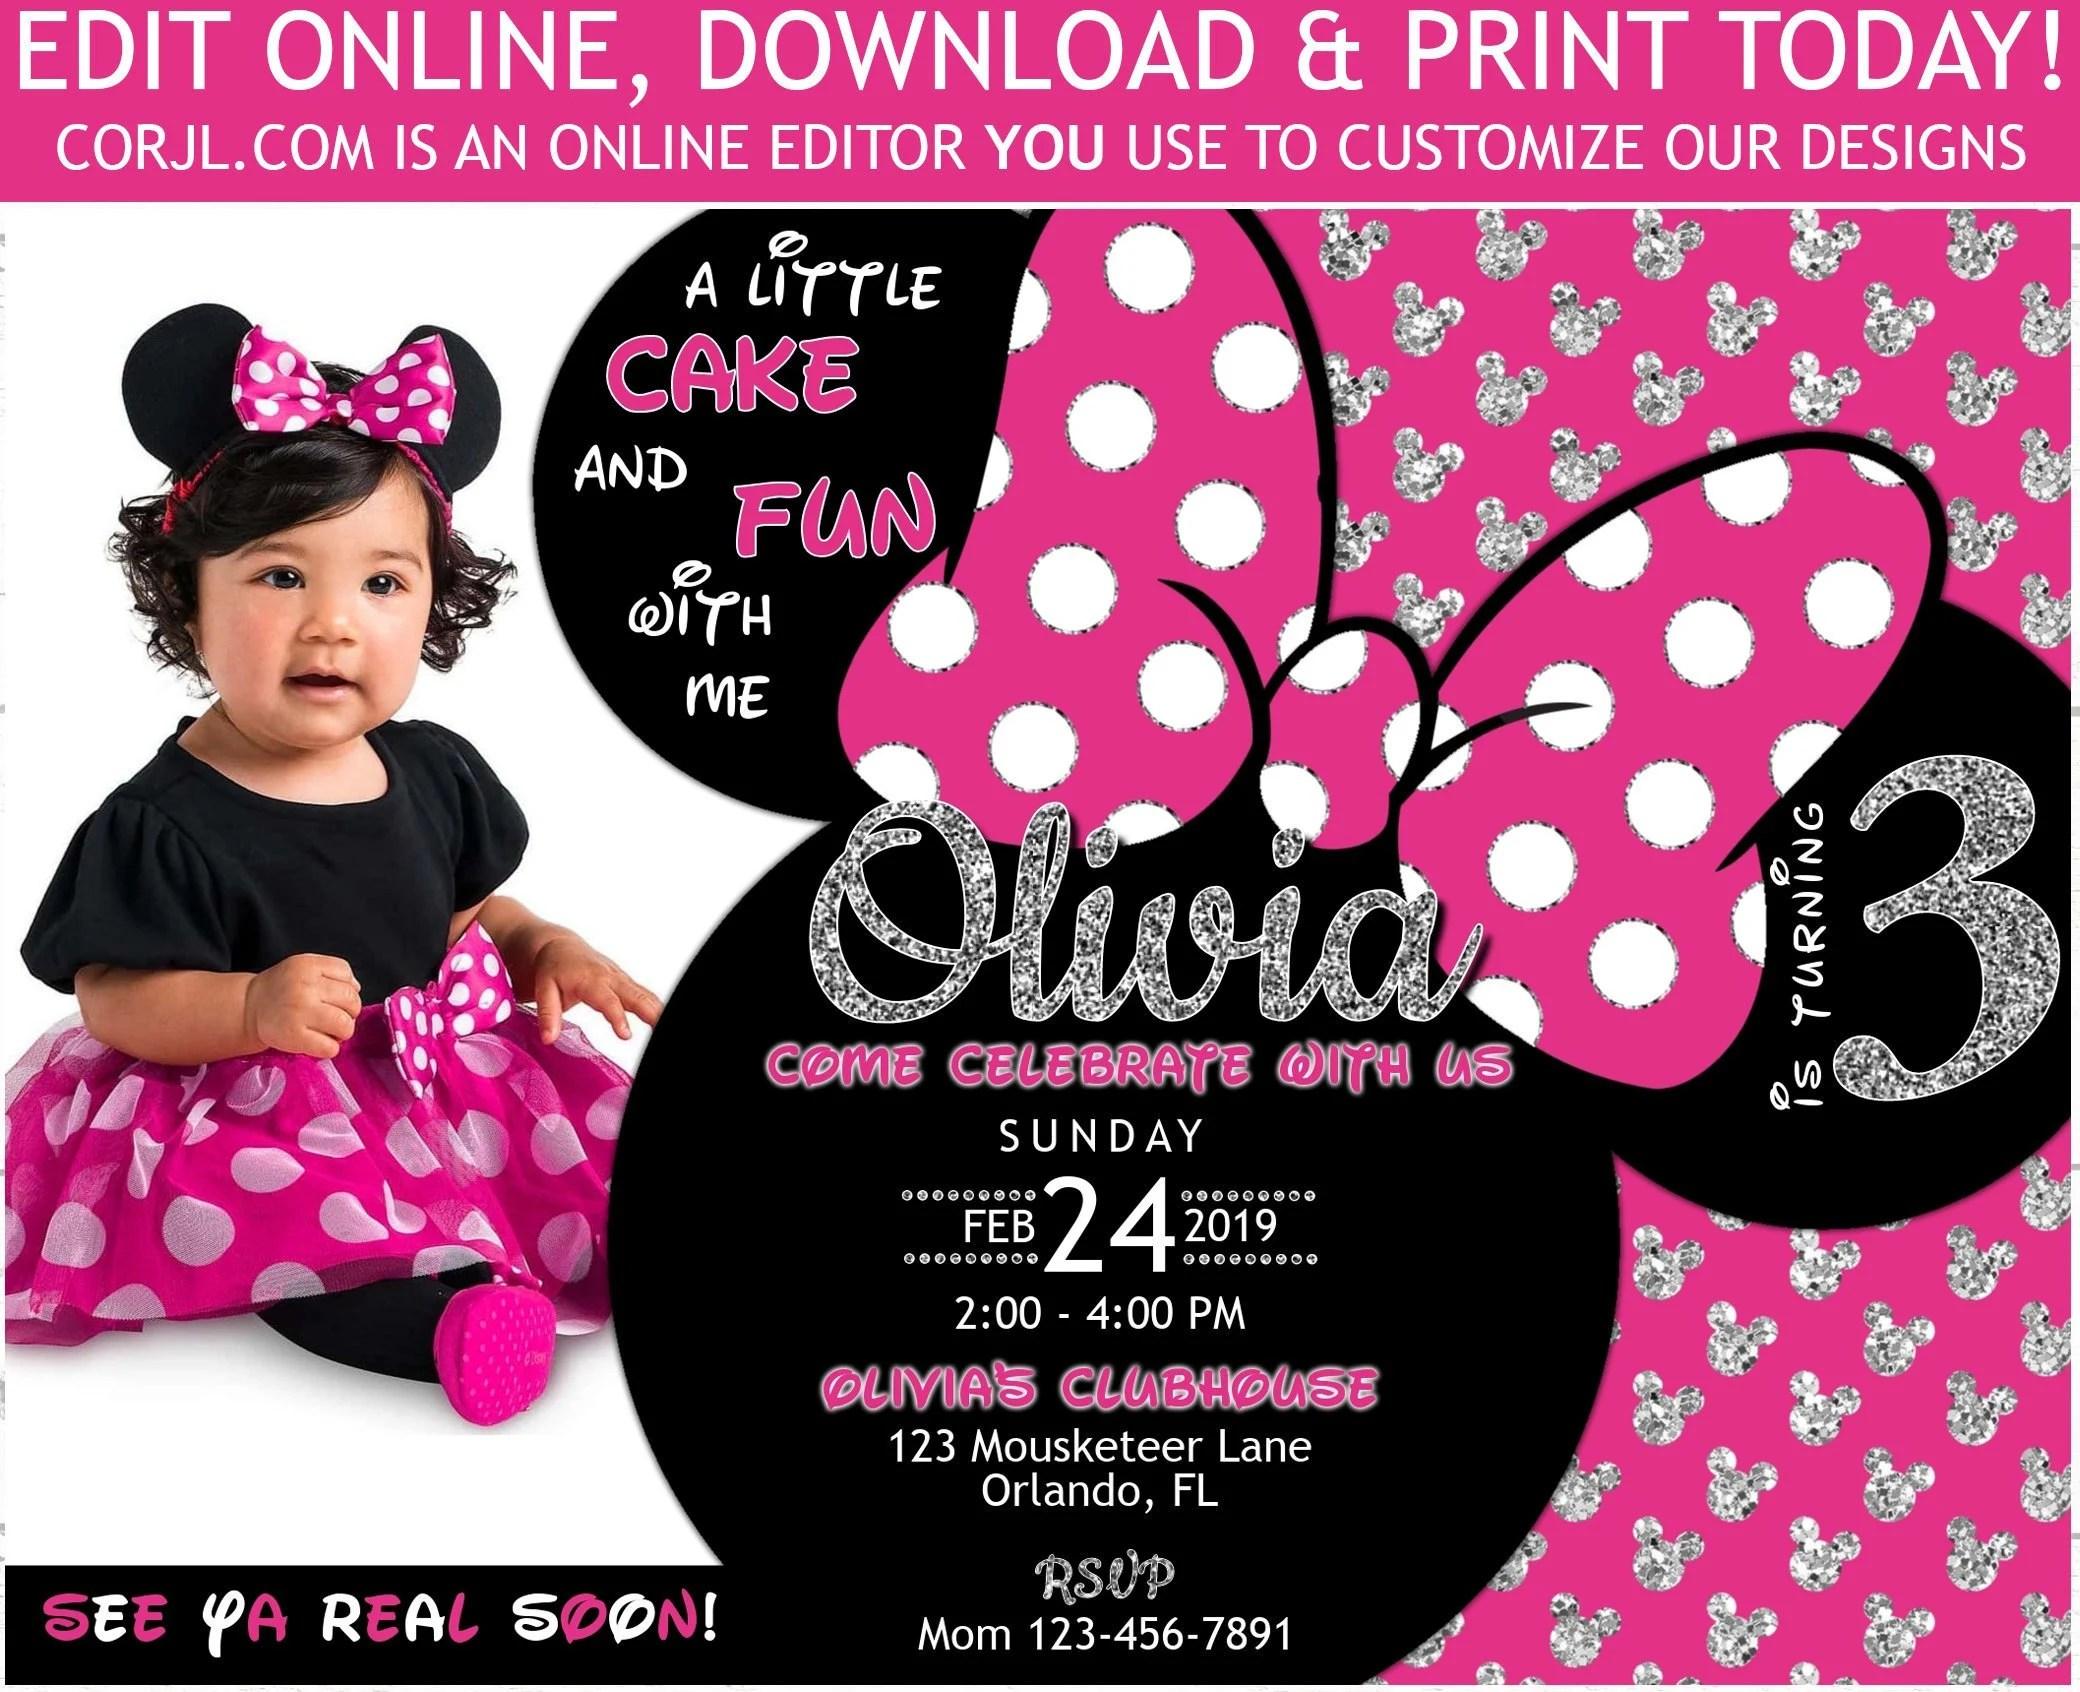 minnie mouse 3rd birthday invitation with photo minnie third birthday 5x7 diy editable invite template printable birthday invitation corjl